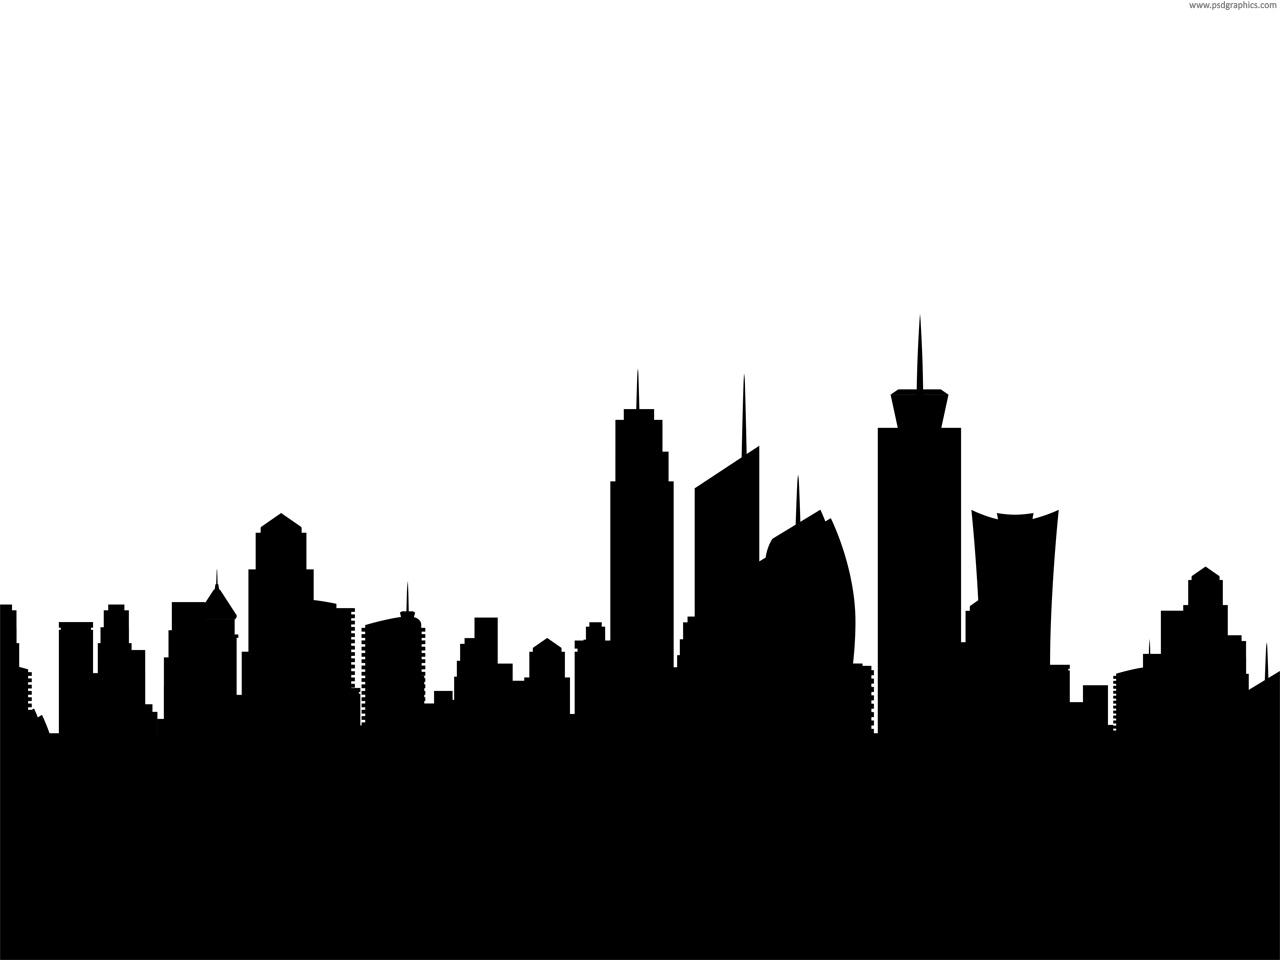 Bethlehem clipart cityscape. City skyline silhouette clip